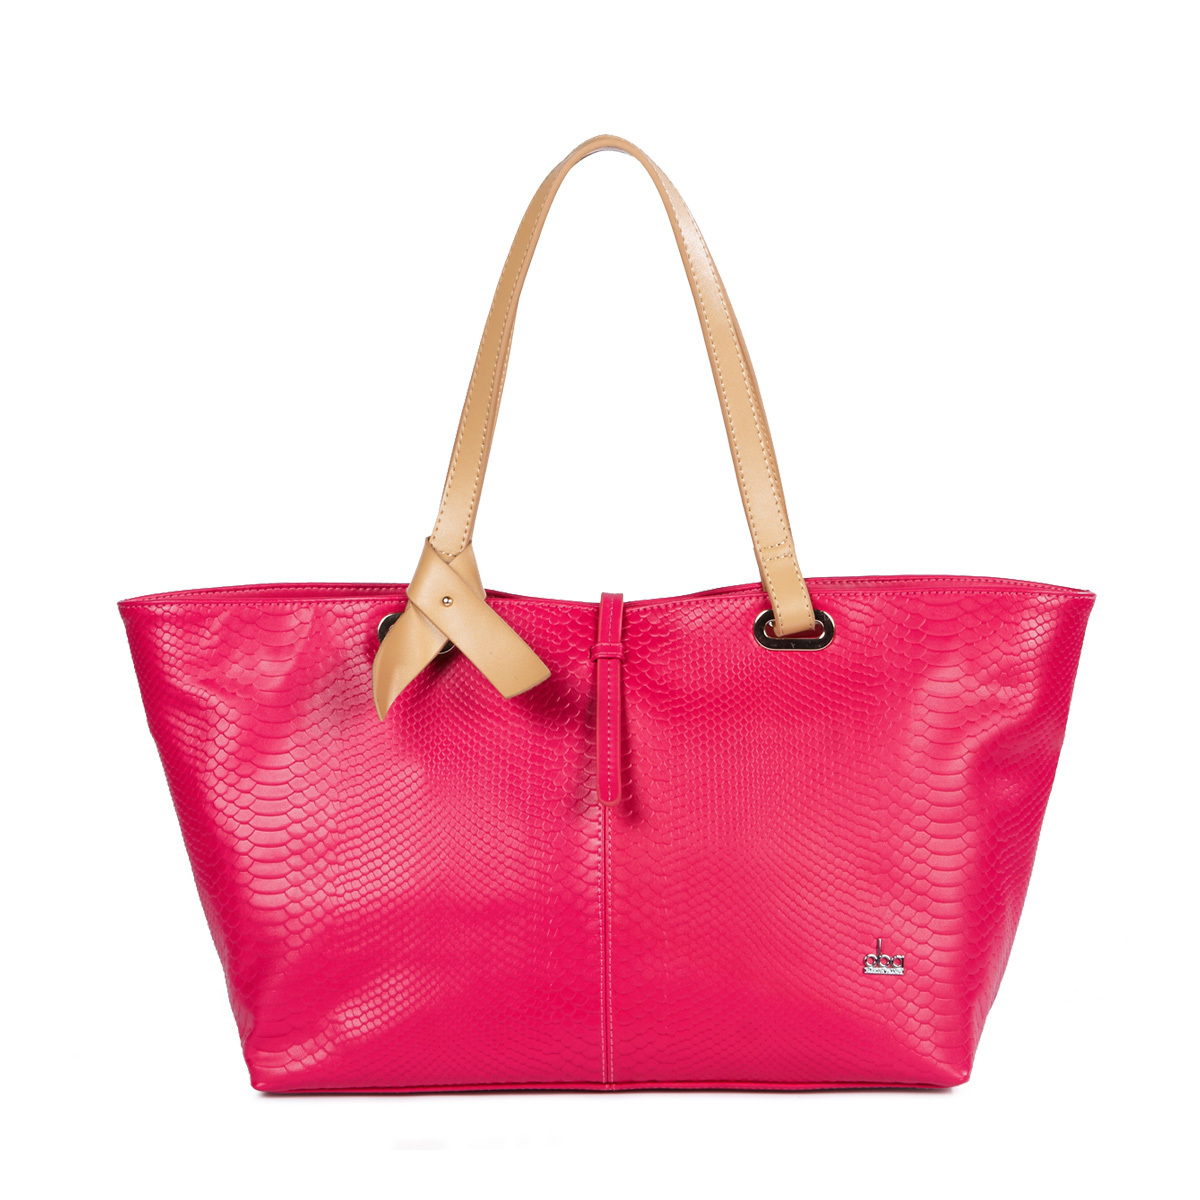 Цвет: красно-розовый цвет